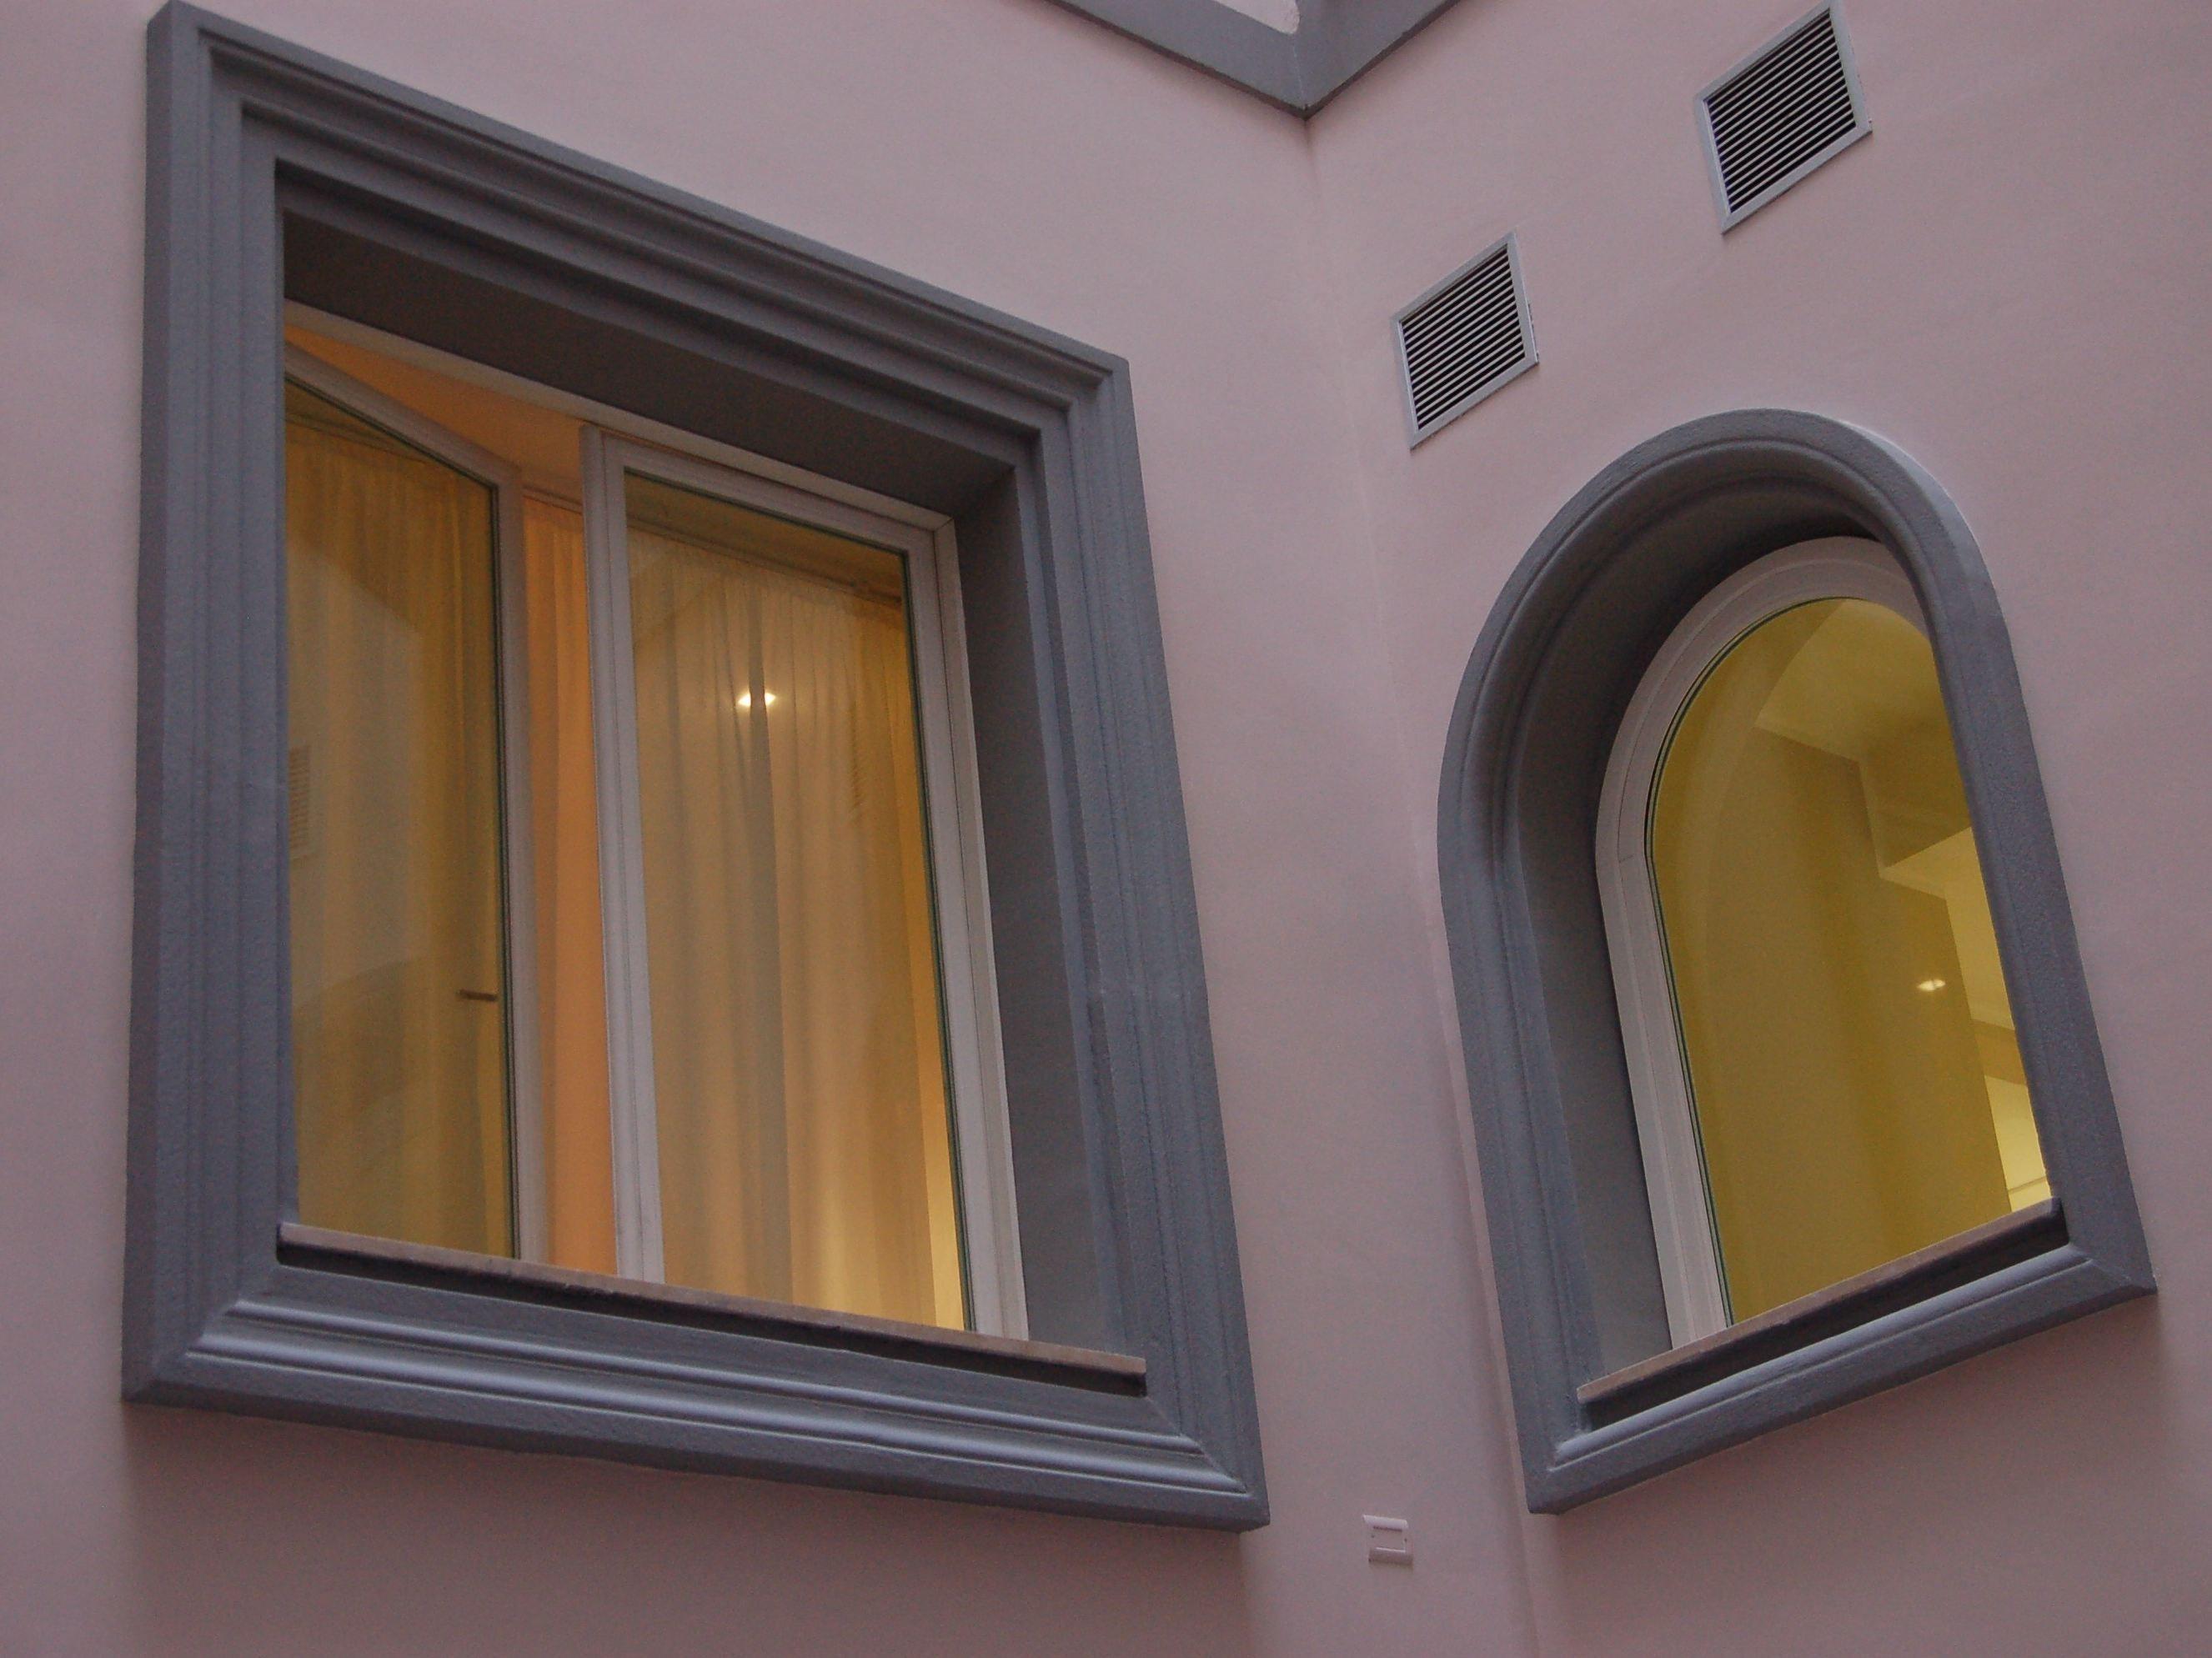 Cornici contorni per finestre by eleni - Soglie per finestre moderne ...